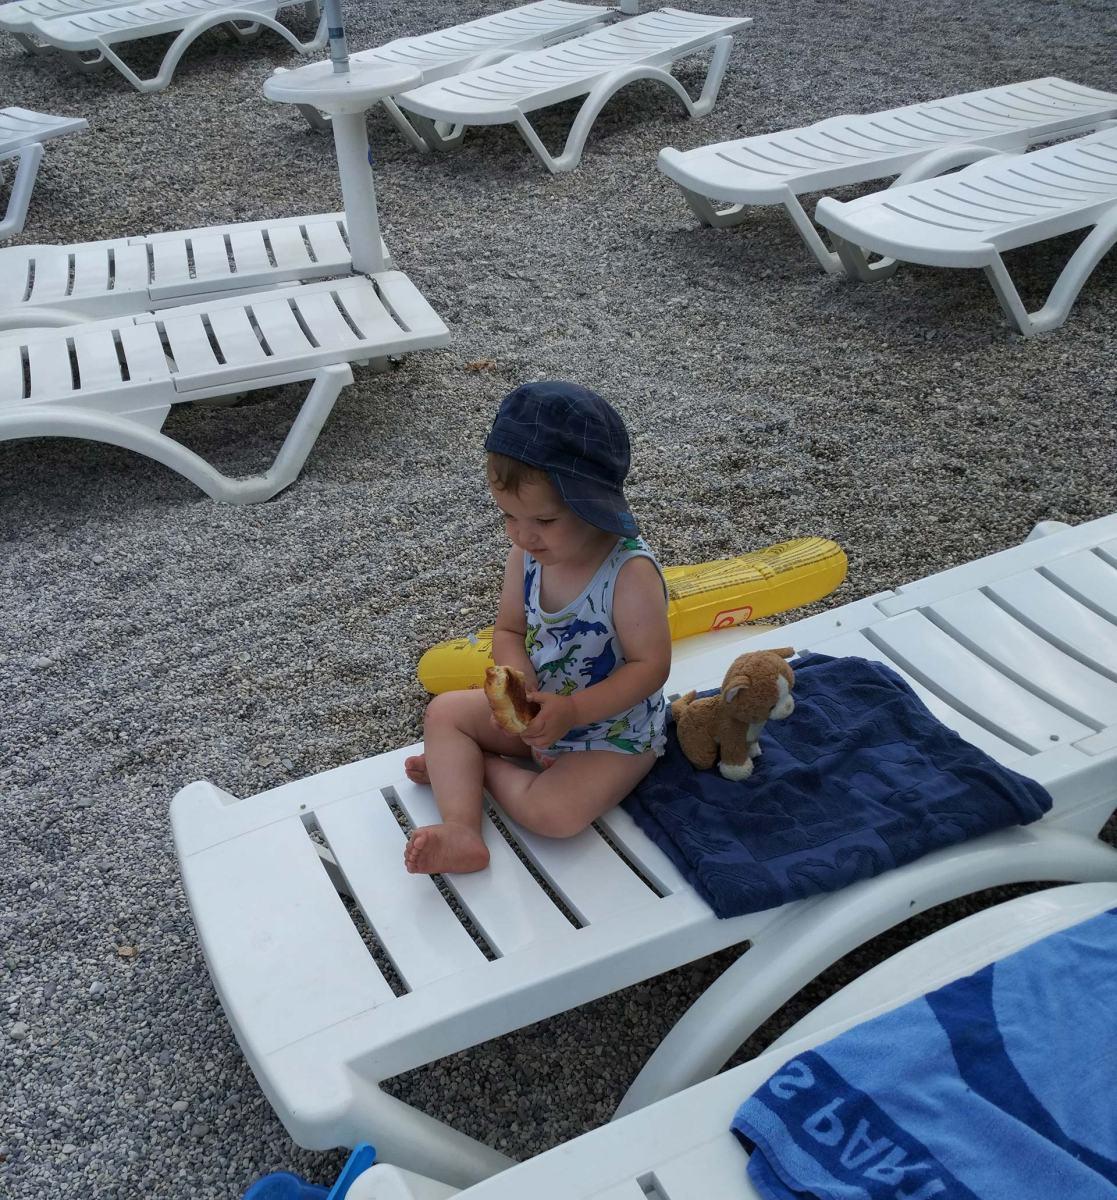 30-dnevni oddih na morju z malčkom